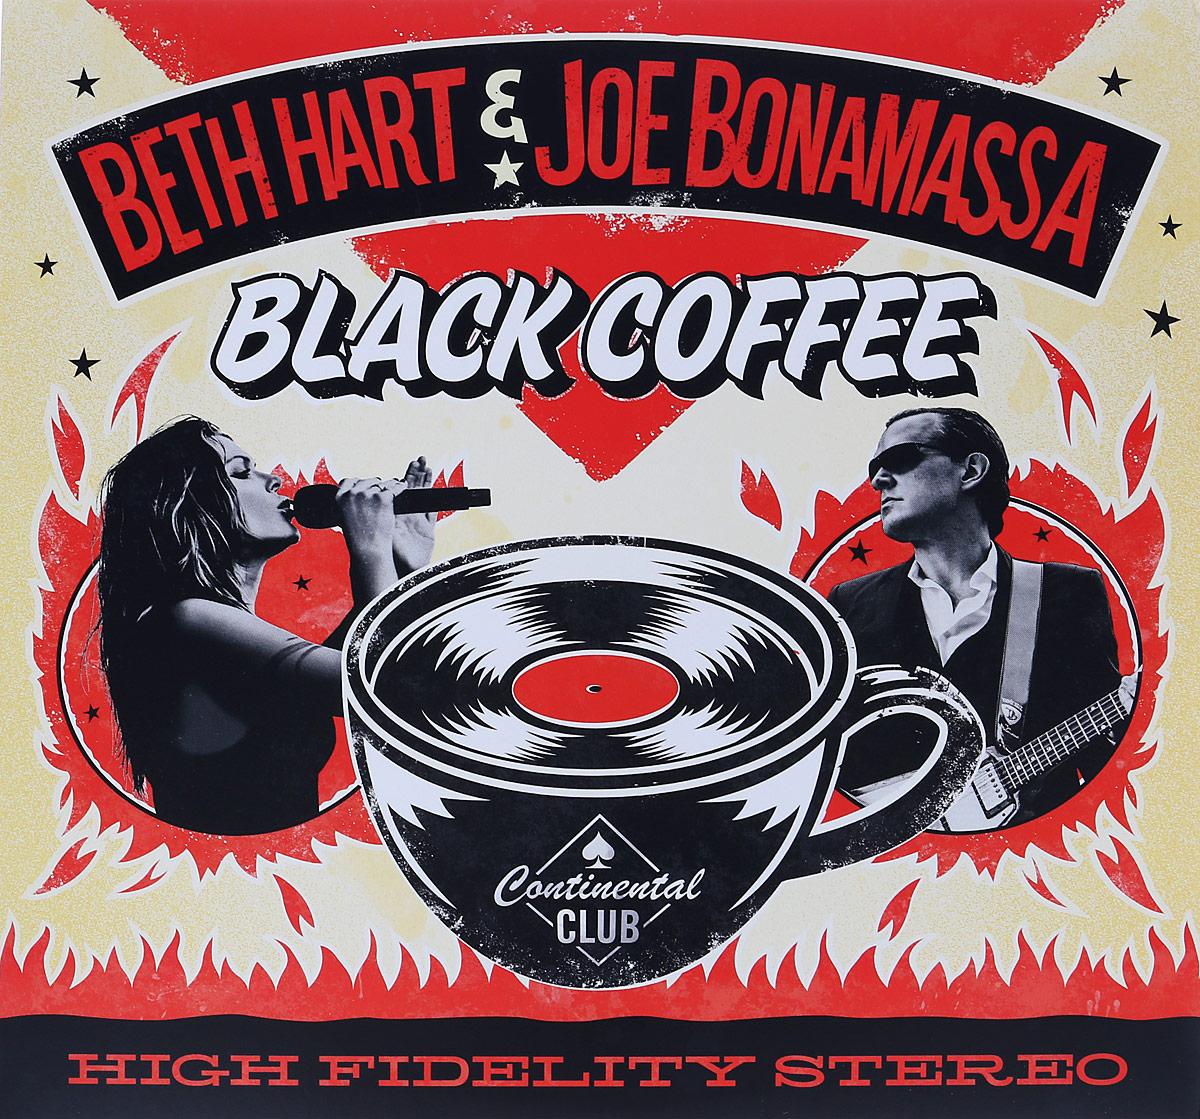 Бет Хат,Джо Бонамасса Beth Hart & Joe Bonamassa. Black Coffee (2 LP) beth hart praha